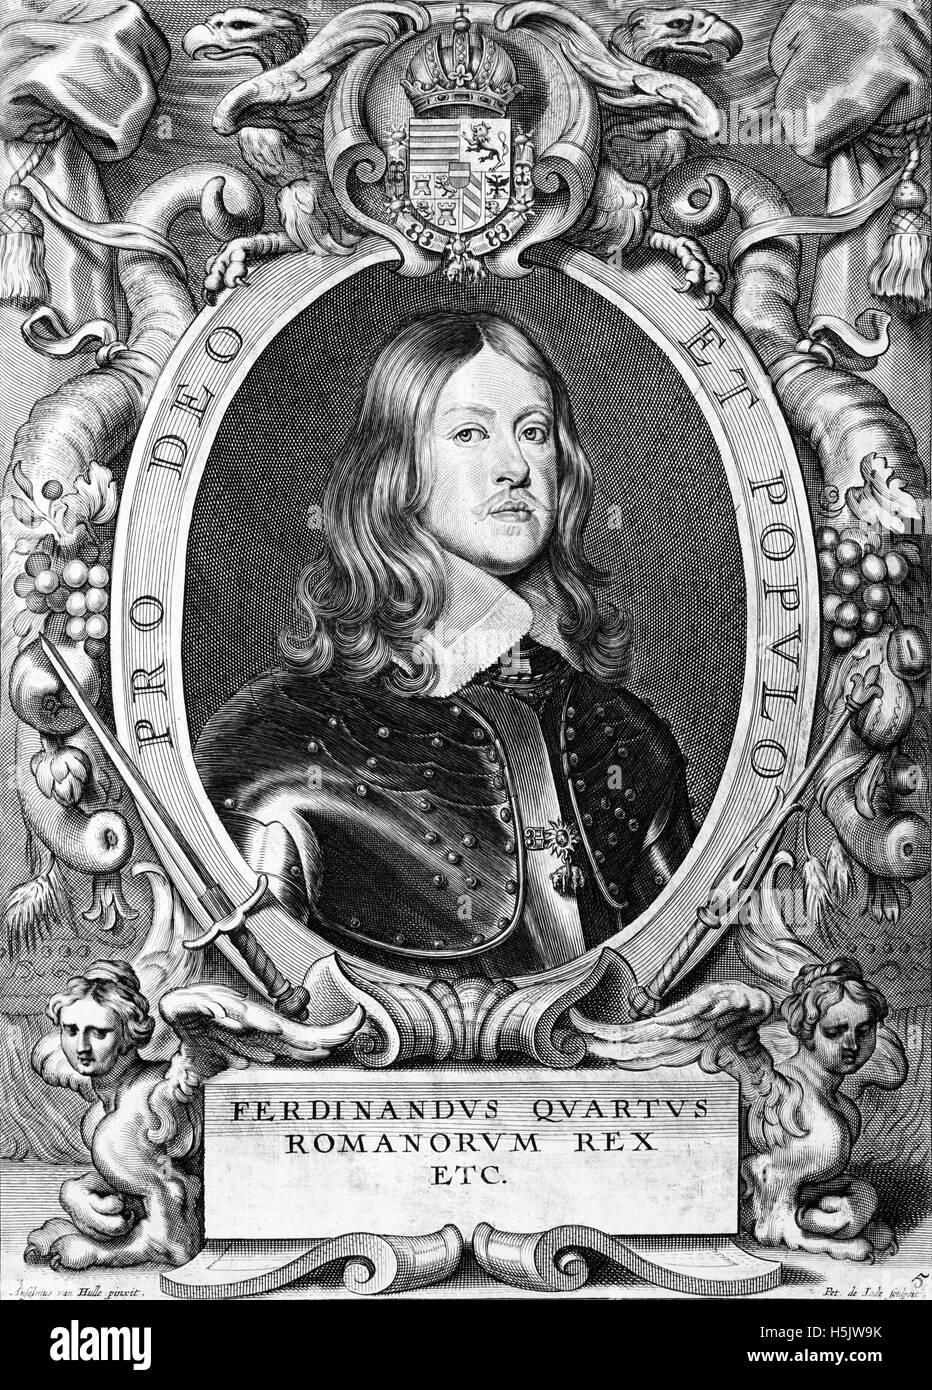 FERDINAND IV King of the Romans (1633-1654) - Stock Image